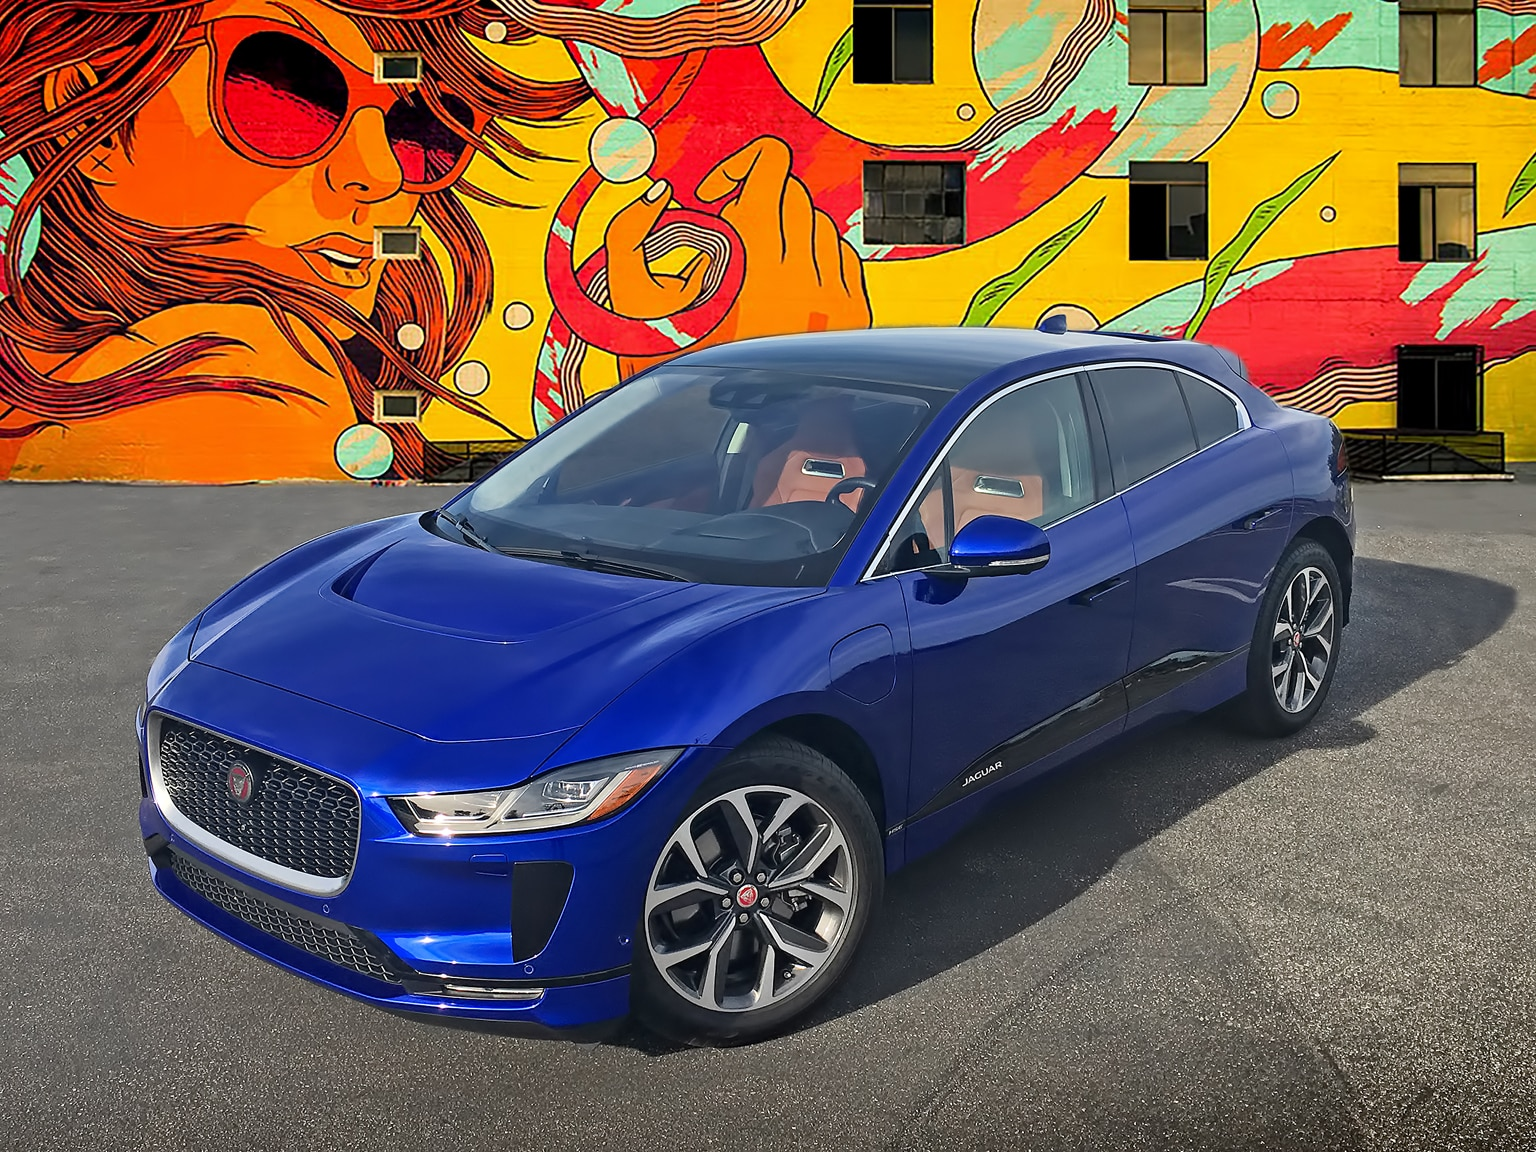 2019 Jaguar I-Pace EV: Design, Specs, Mileage, Price >> 2019 Jaguar I Pace Ev400 Is Unlike Any Jag Ever Made Automobile